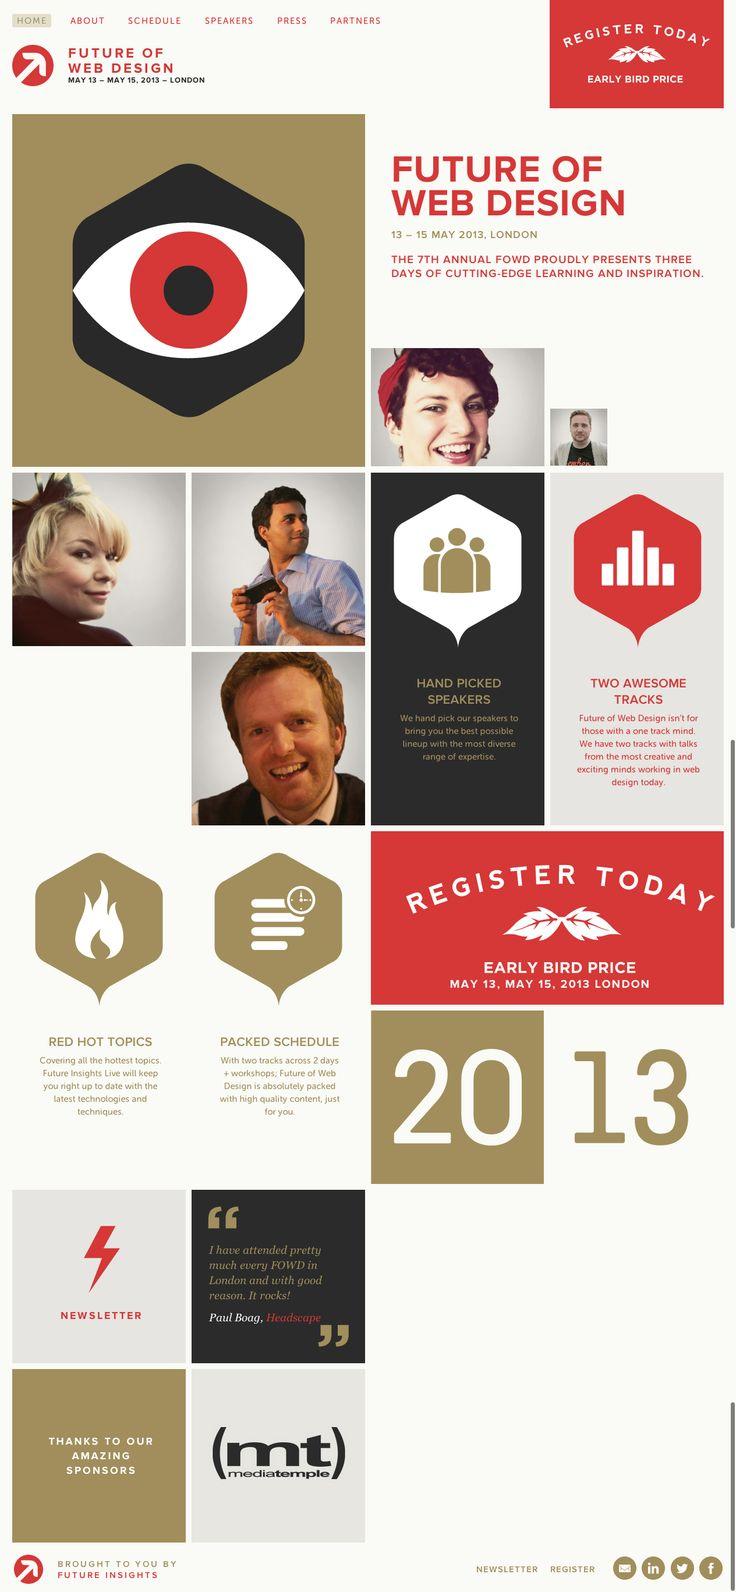 Future of Web Design 2013 | Awesome Screenshot